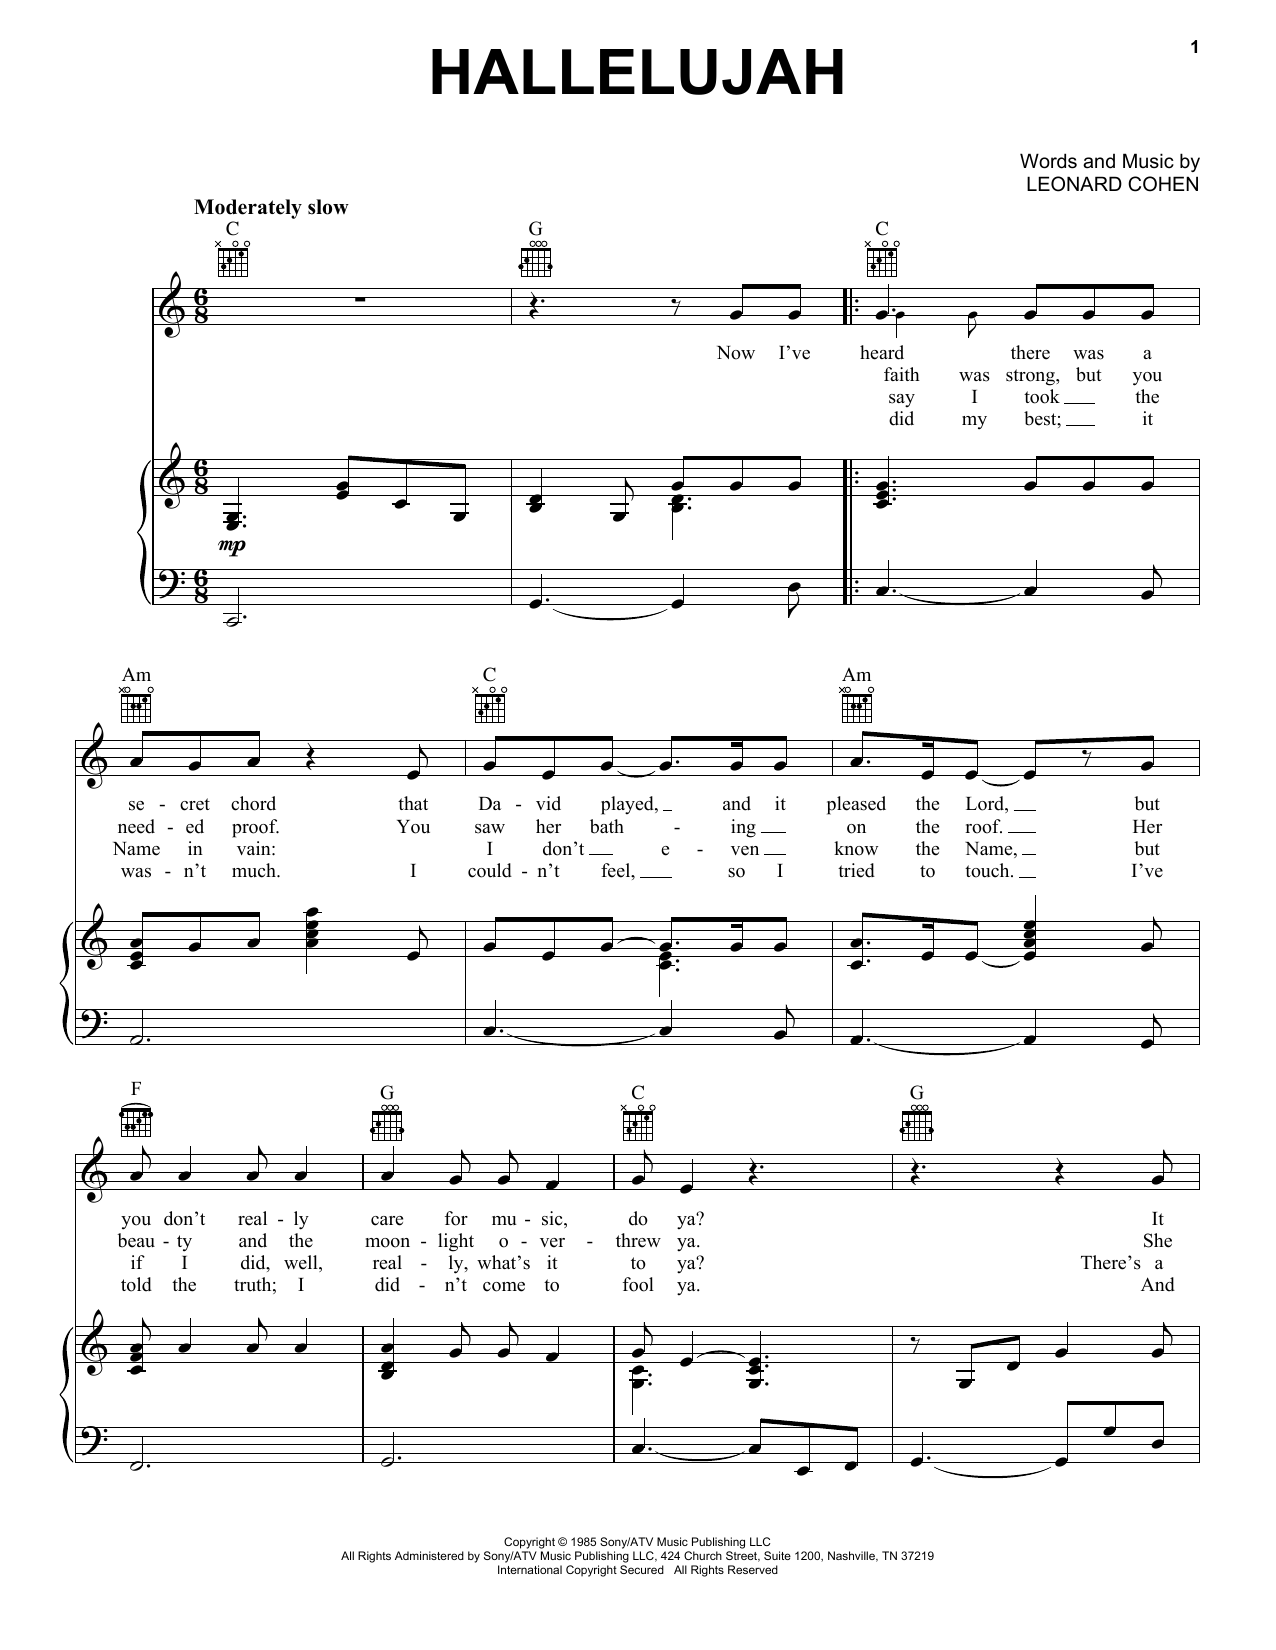 Hallelujah : Sheet Music Direct